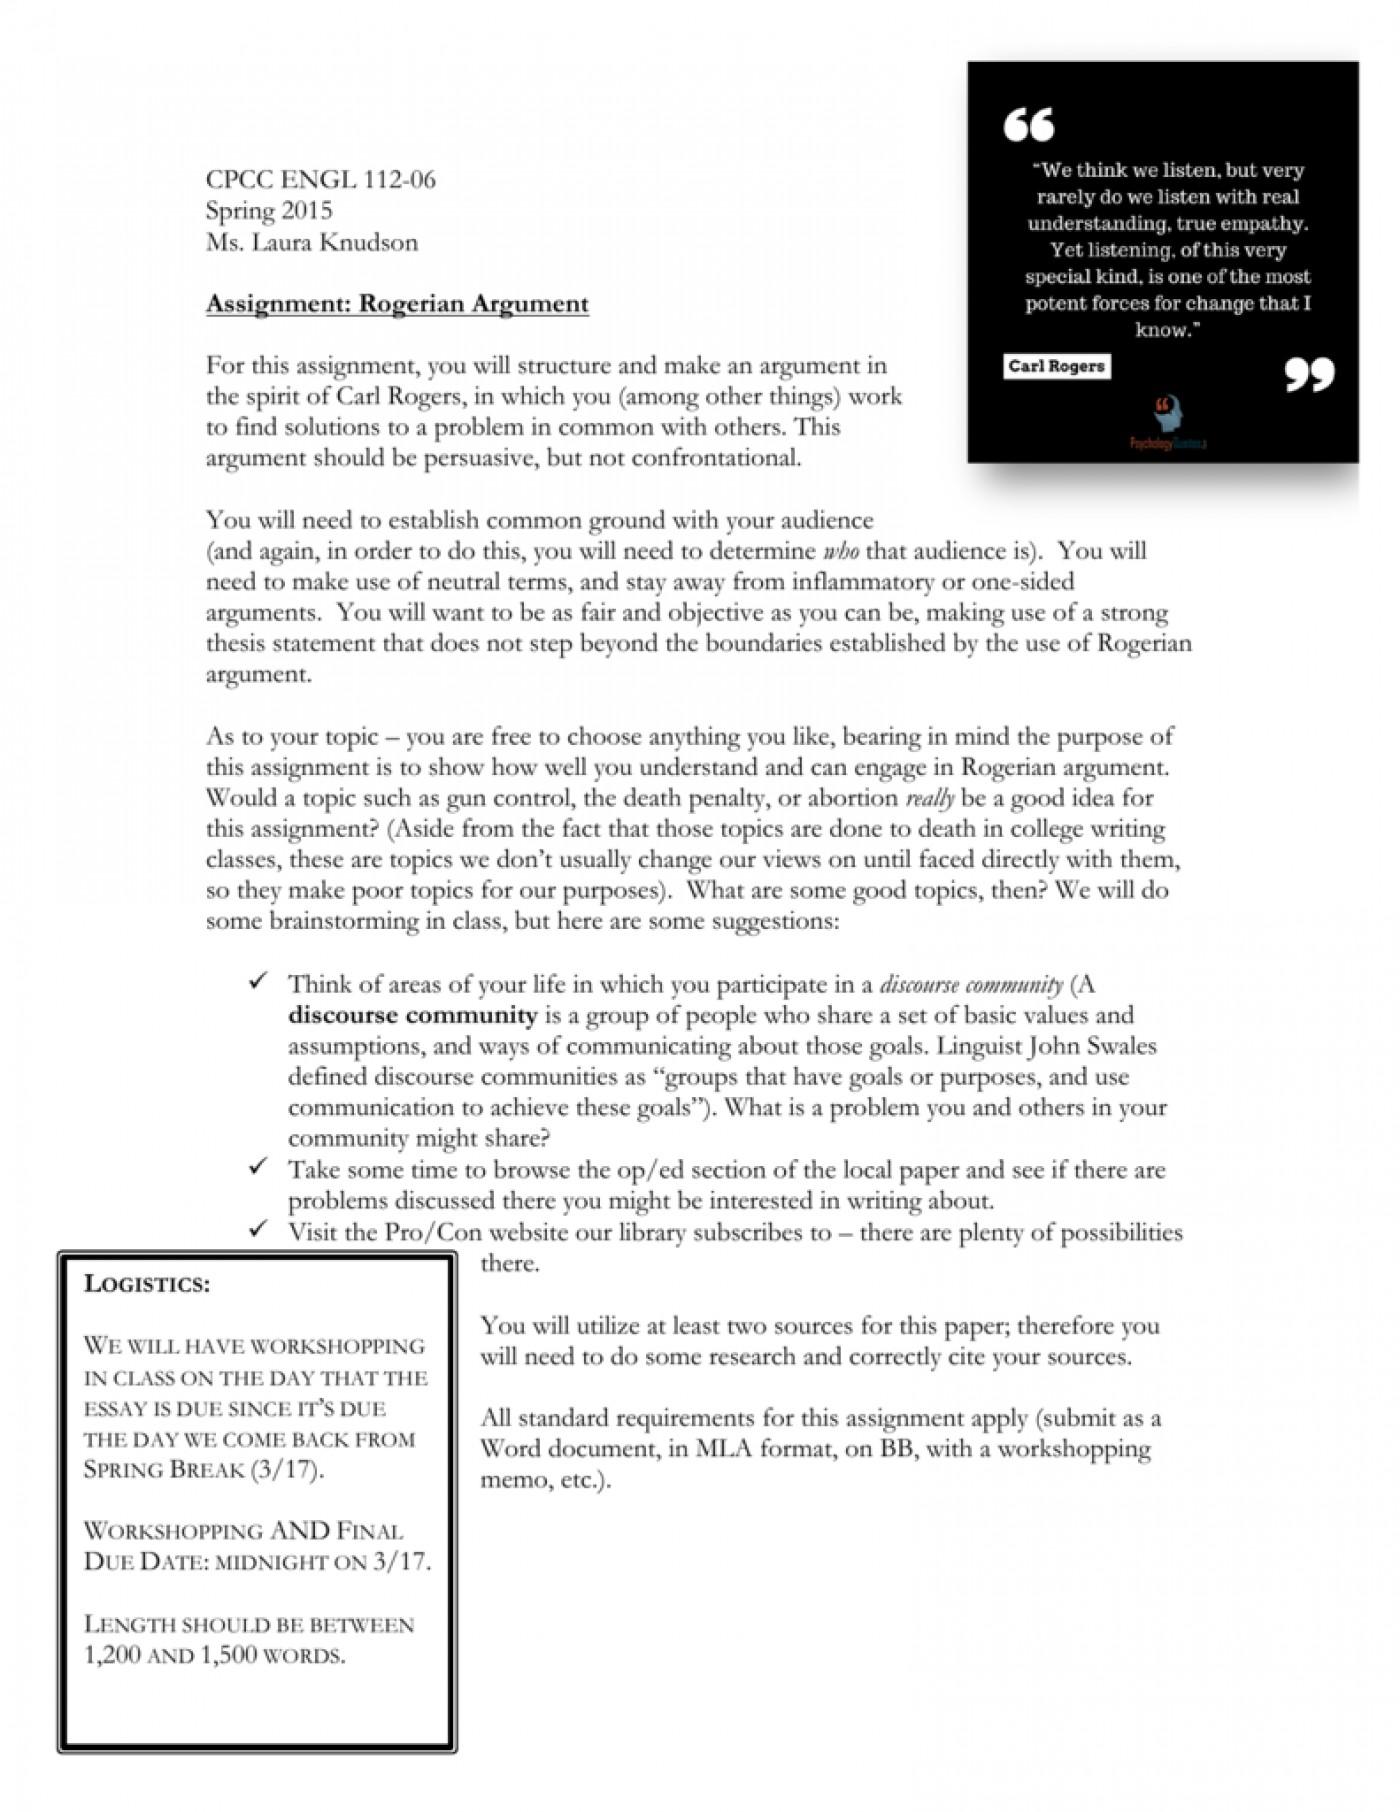 024 008735089 1 Rogerian Essay Best Argument Example Sentence Abortion Style Topics 1400